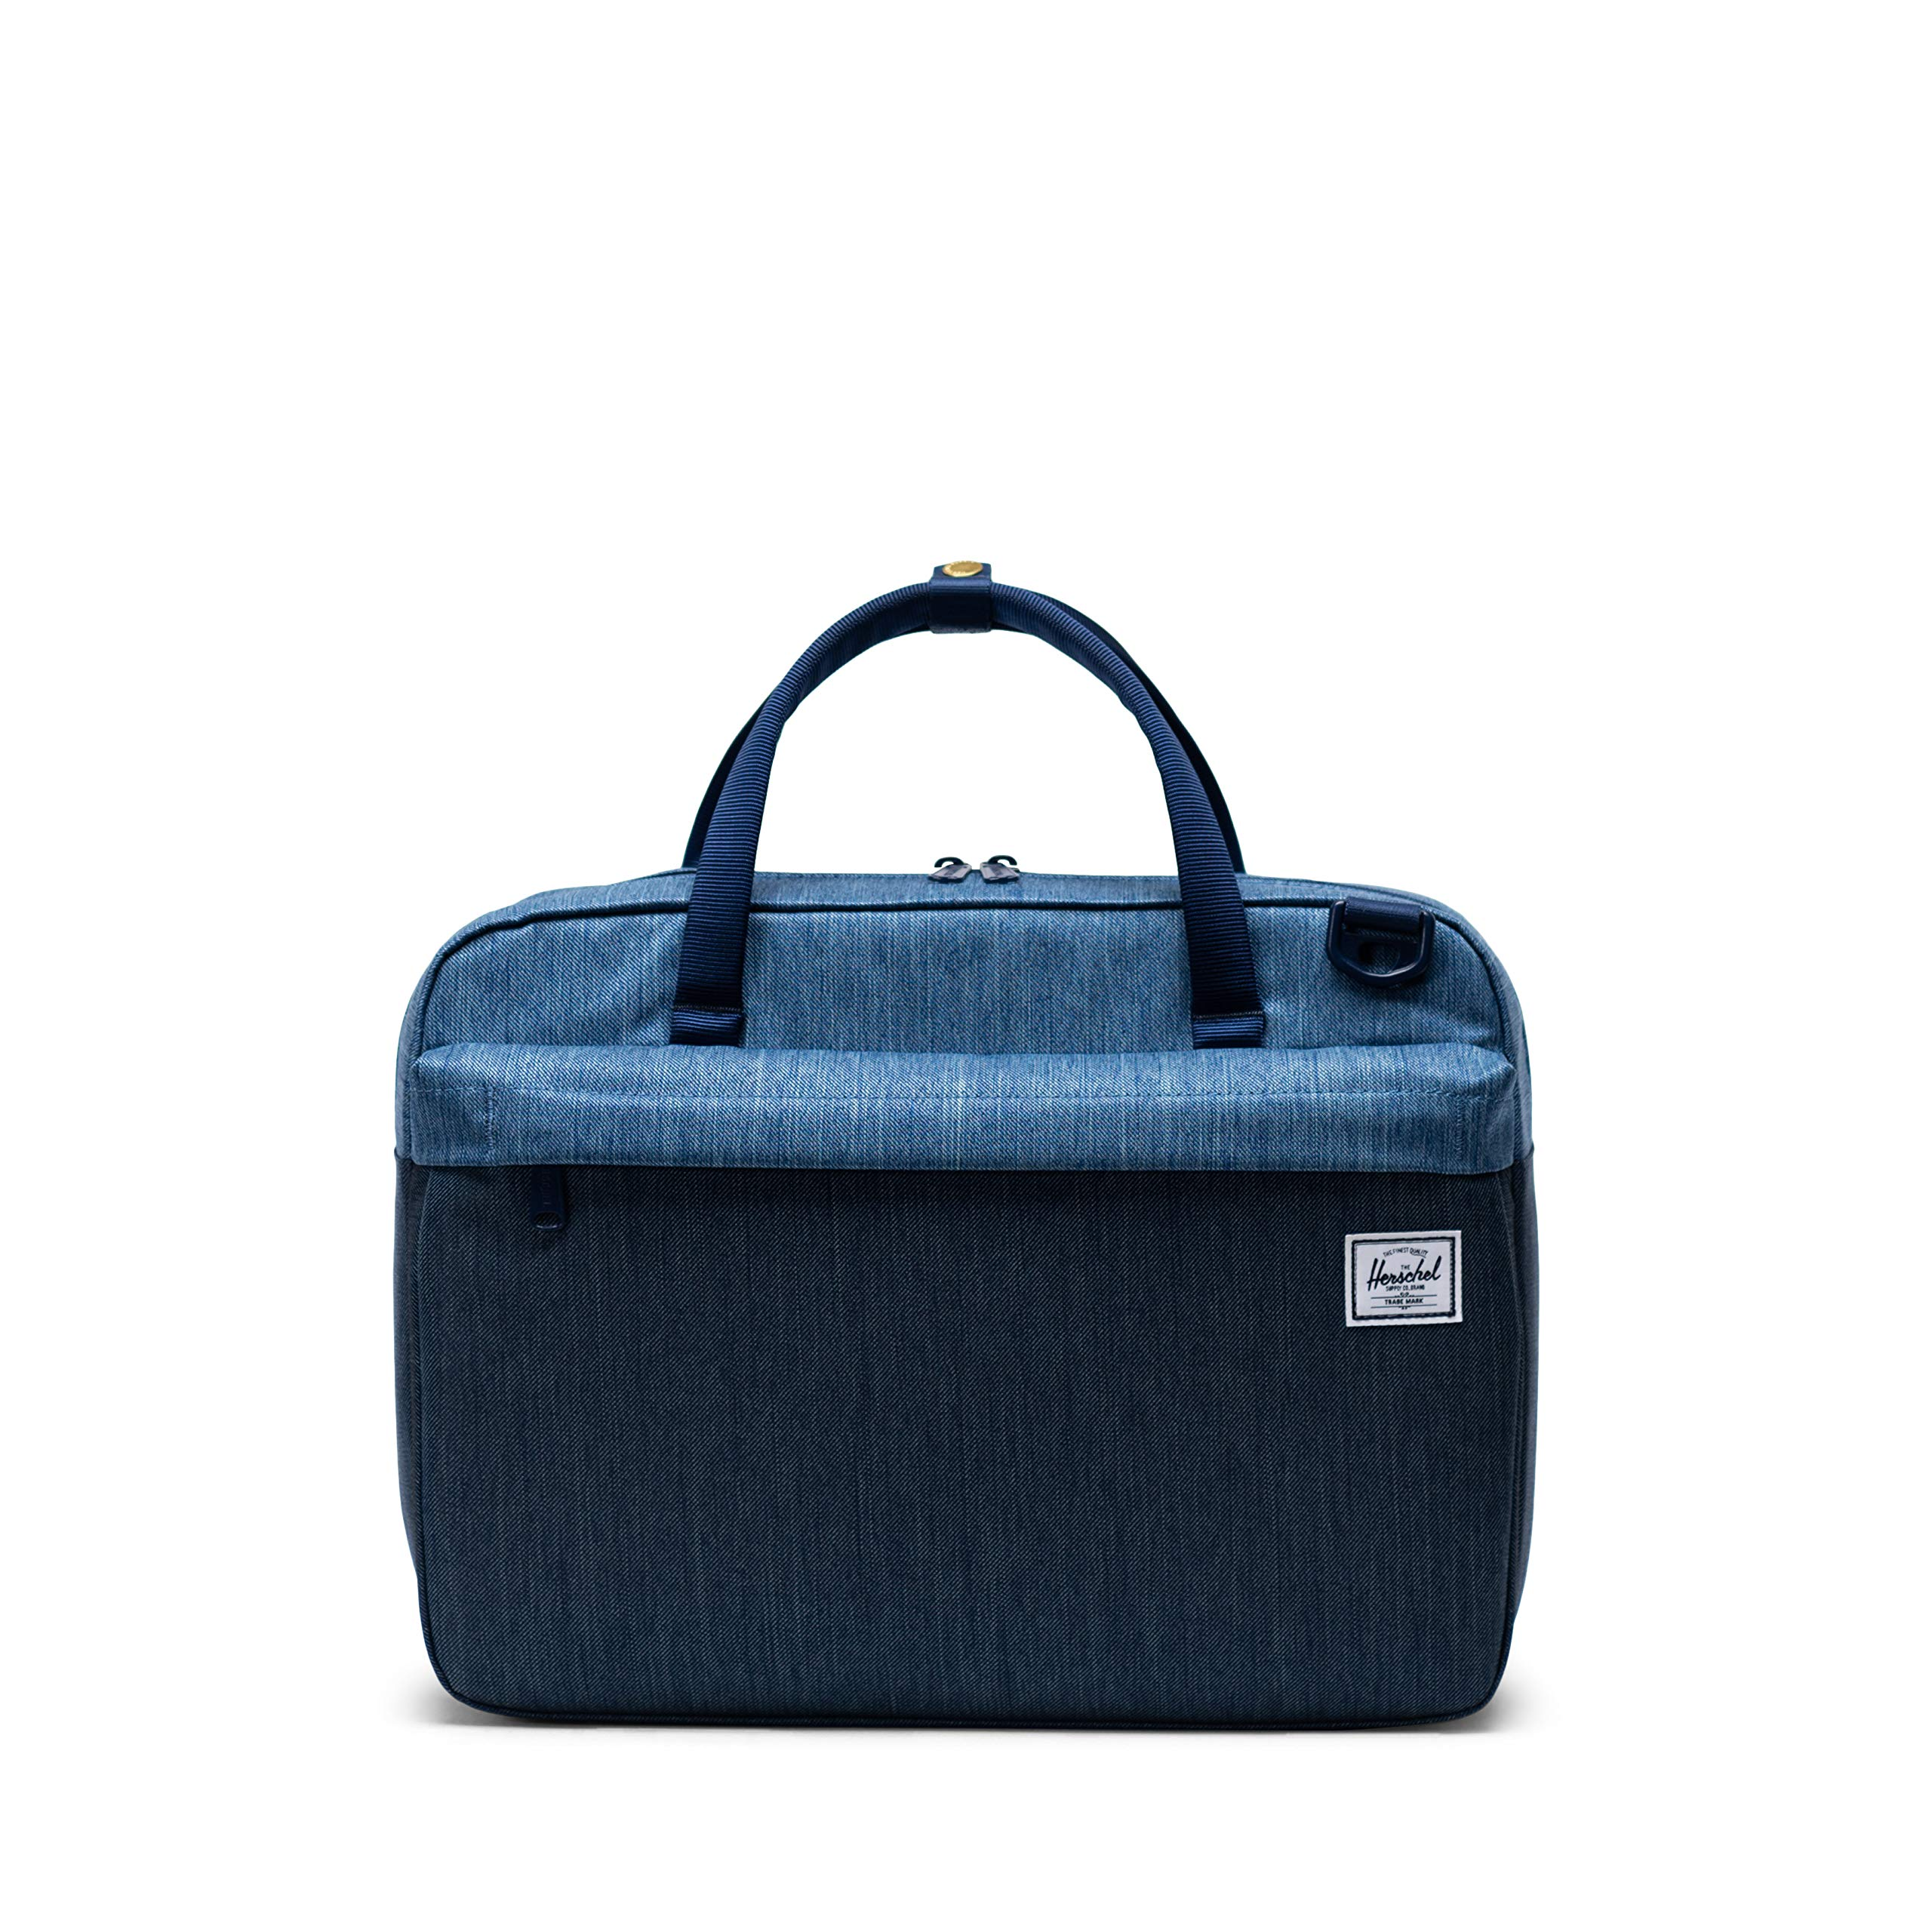 Herschel Gibson Laptop Messenger Bag, Faded Indigo Denim, One Size